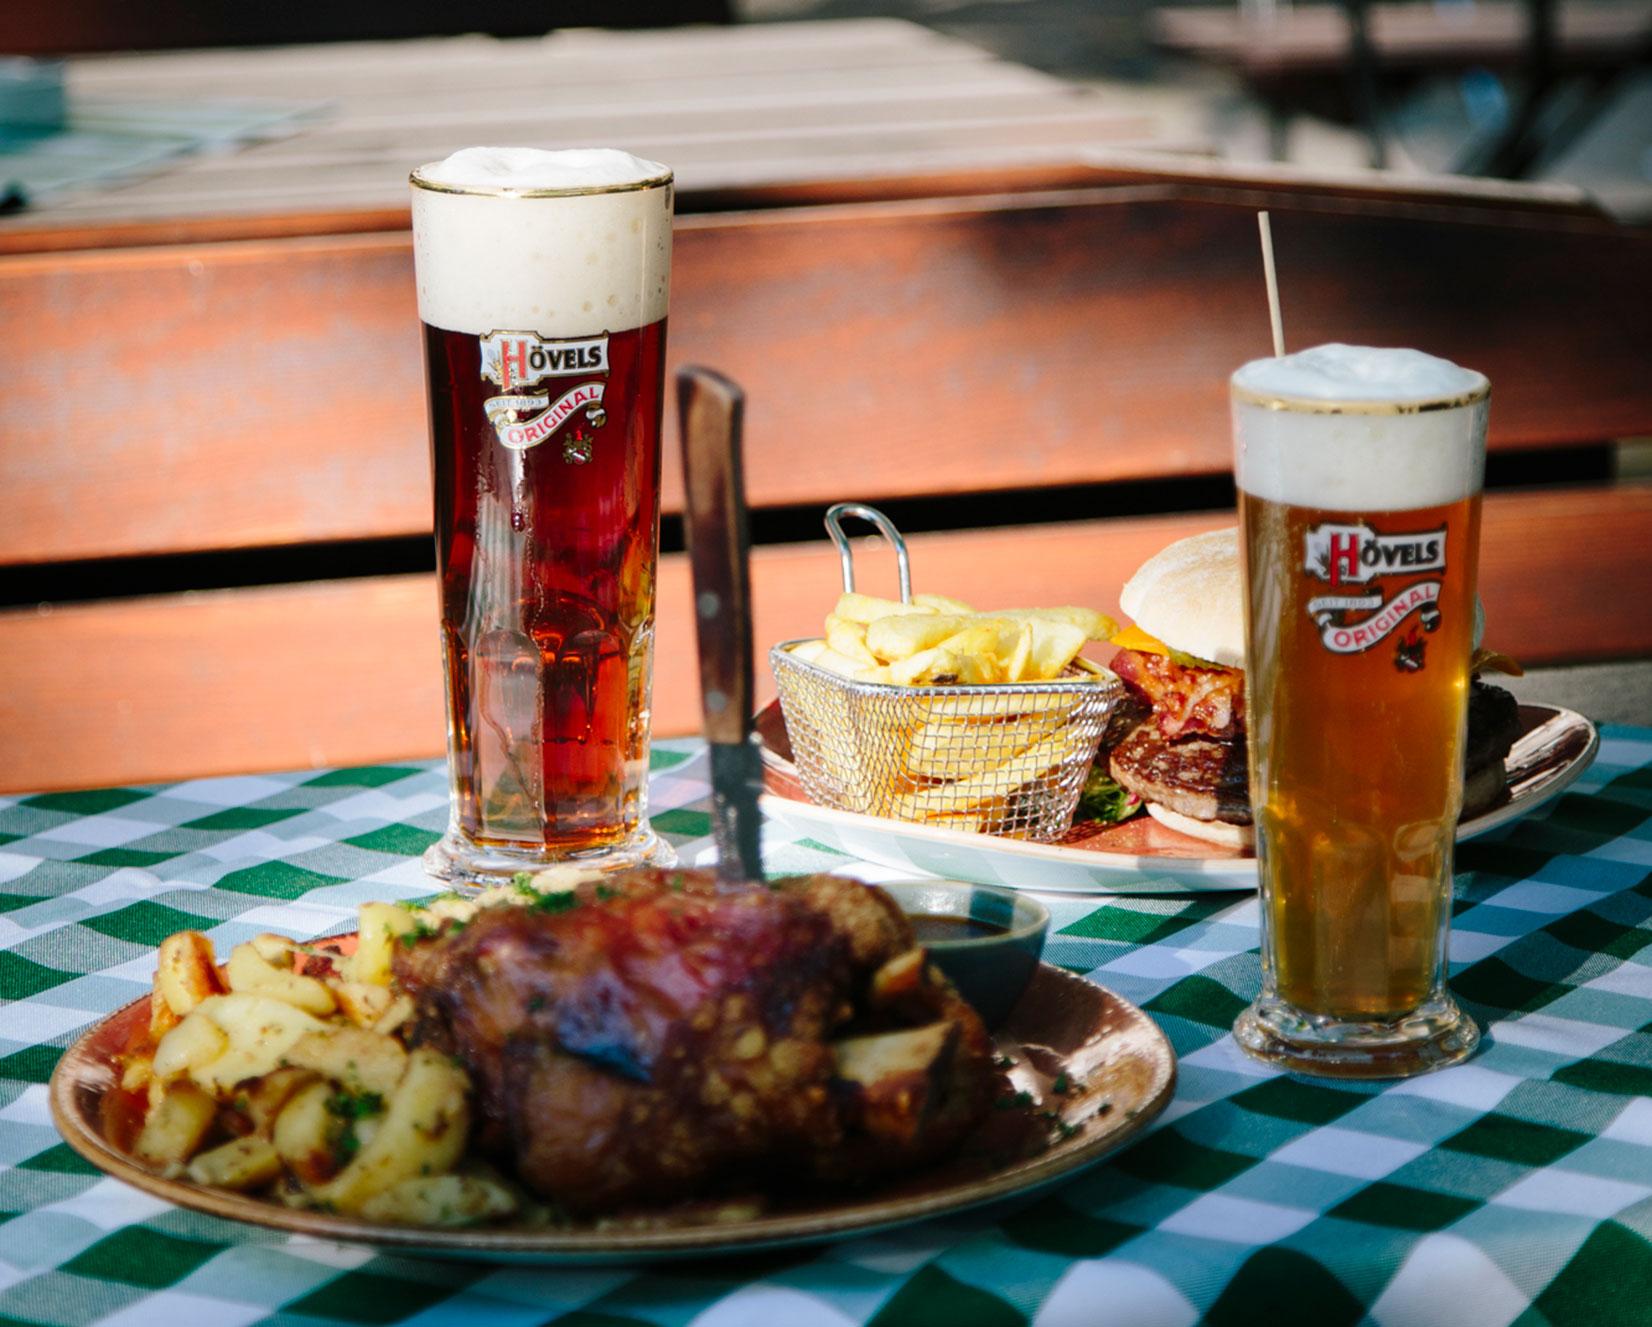 Biergarten Dortmunder Innenstadt - Hövels Hausbrauerei - Haxe & Bier